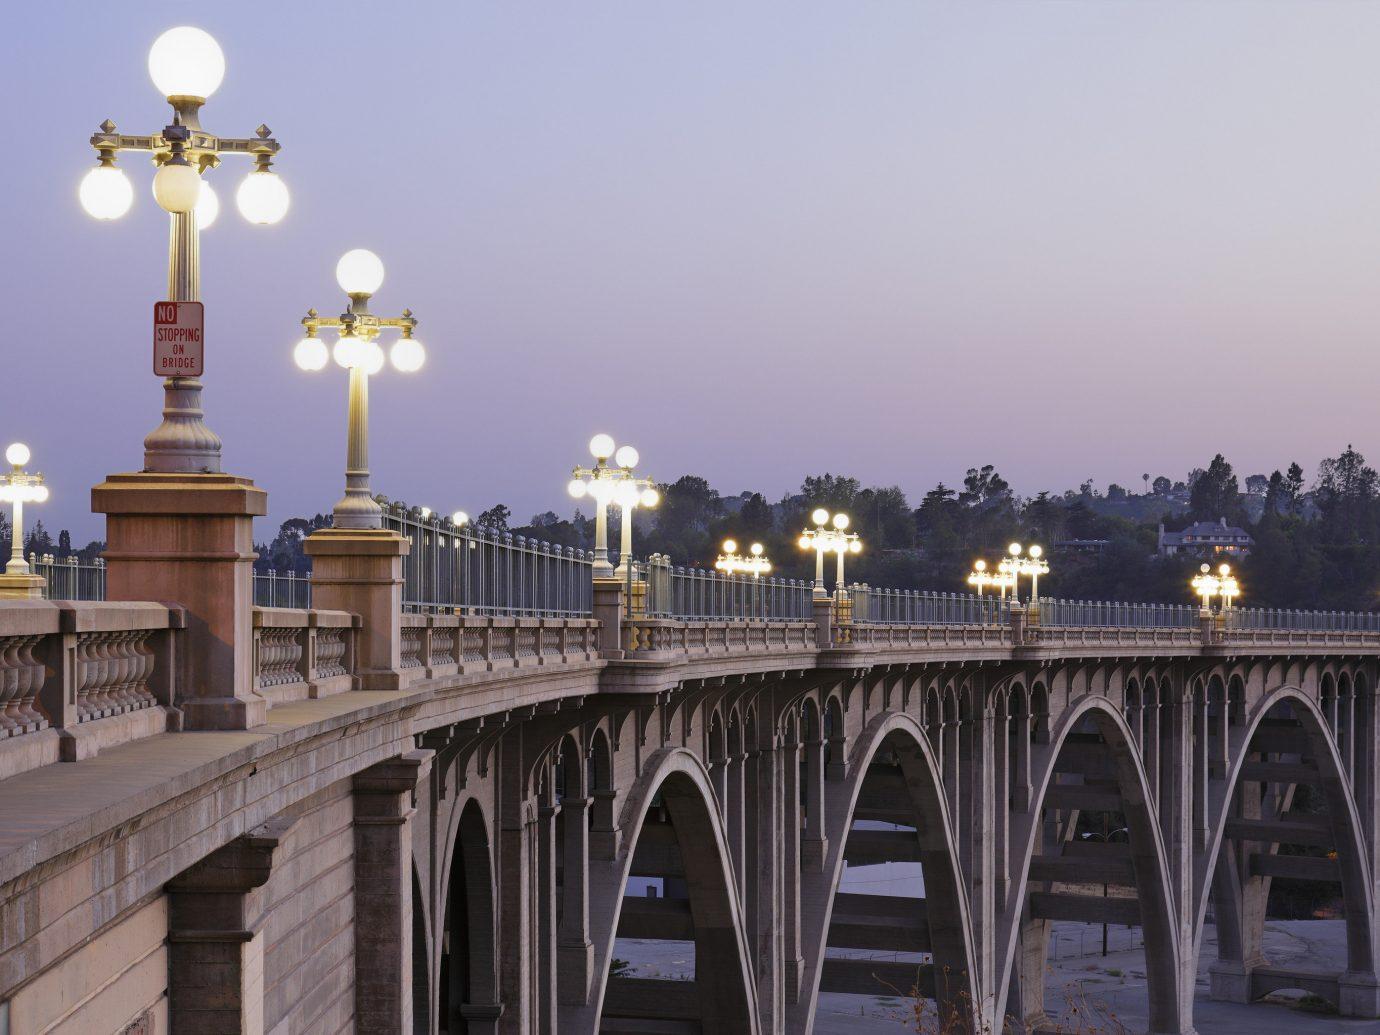 Arts + Culture outdoor sky building landmark bridge yellow tourism cityscape